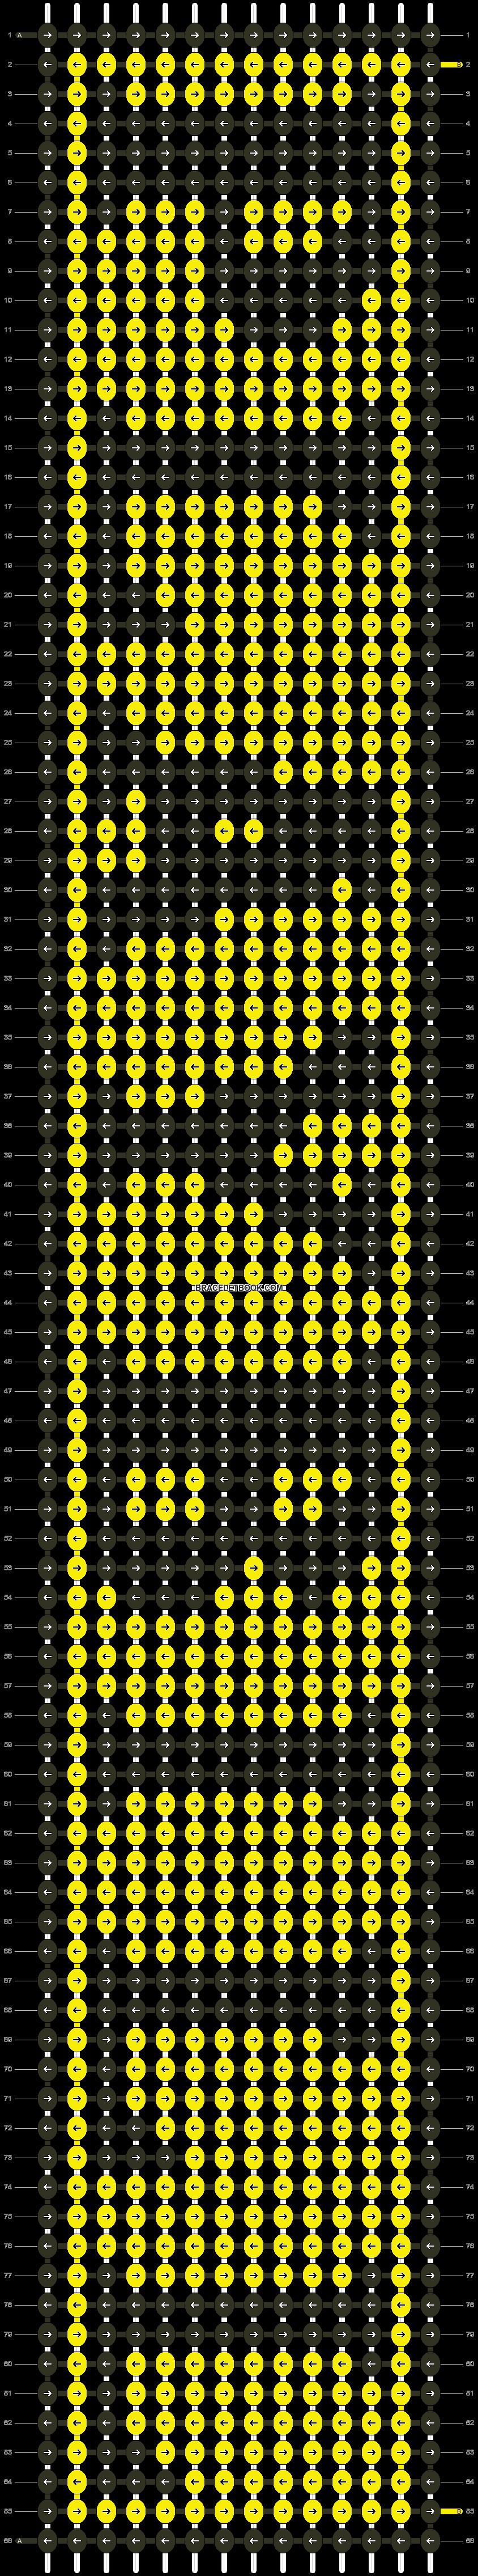 Alpha pattern #20872 pattern